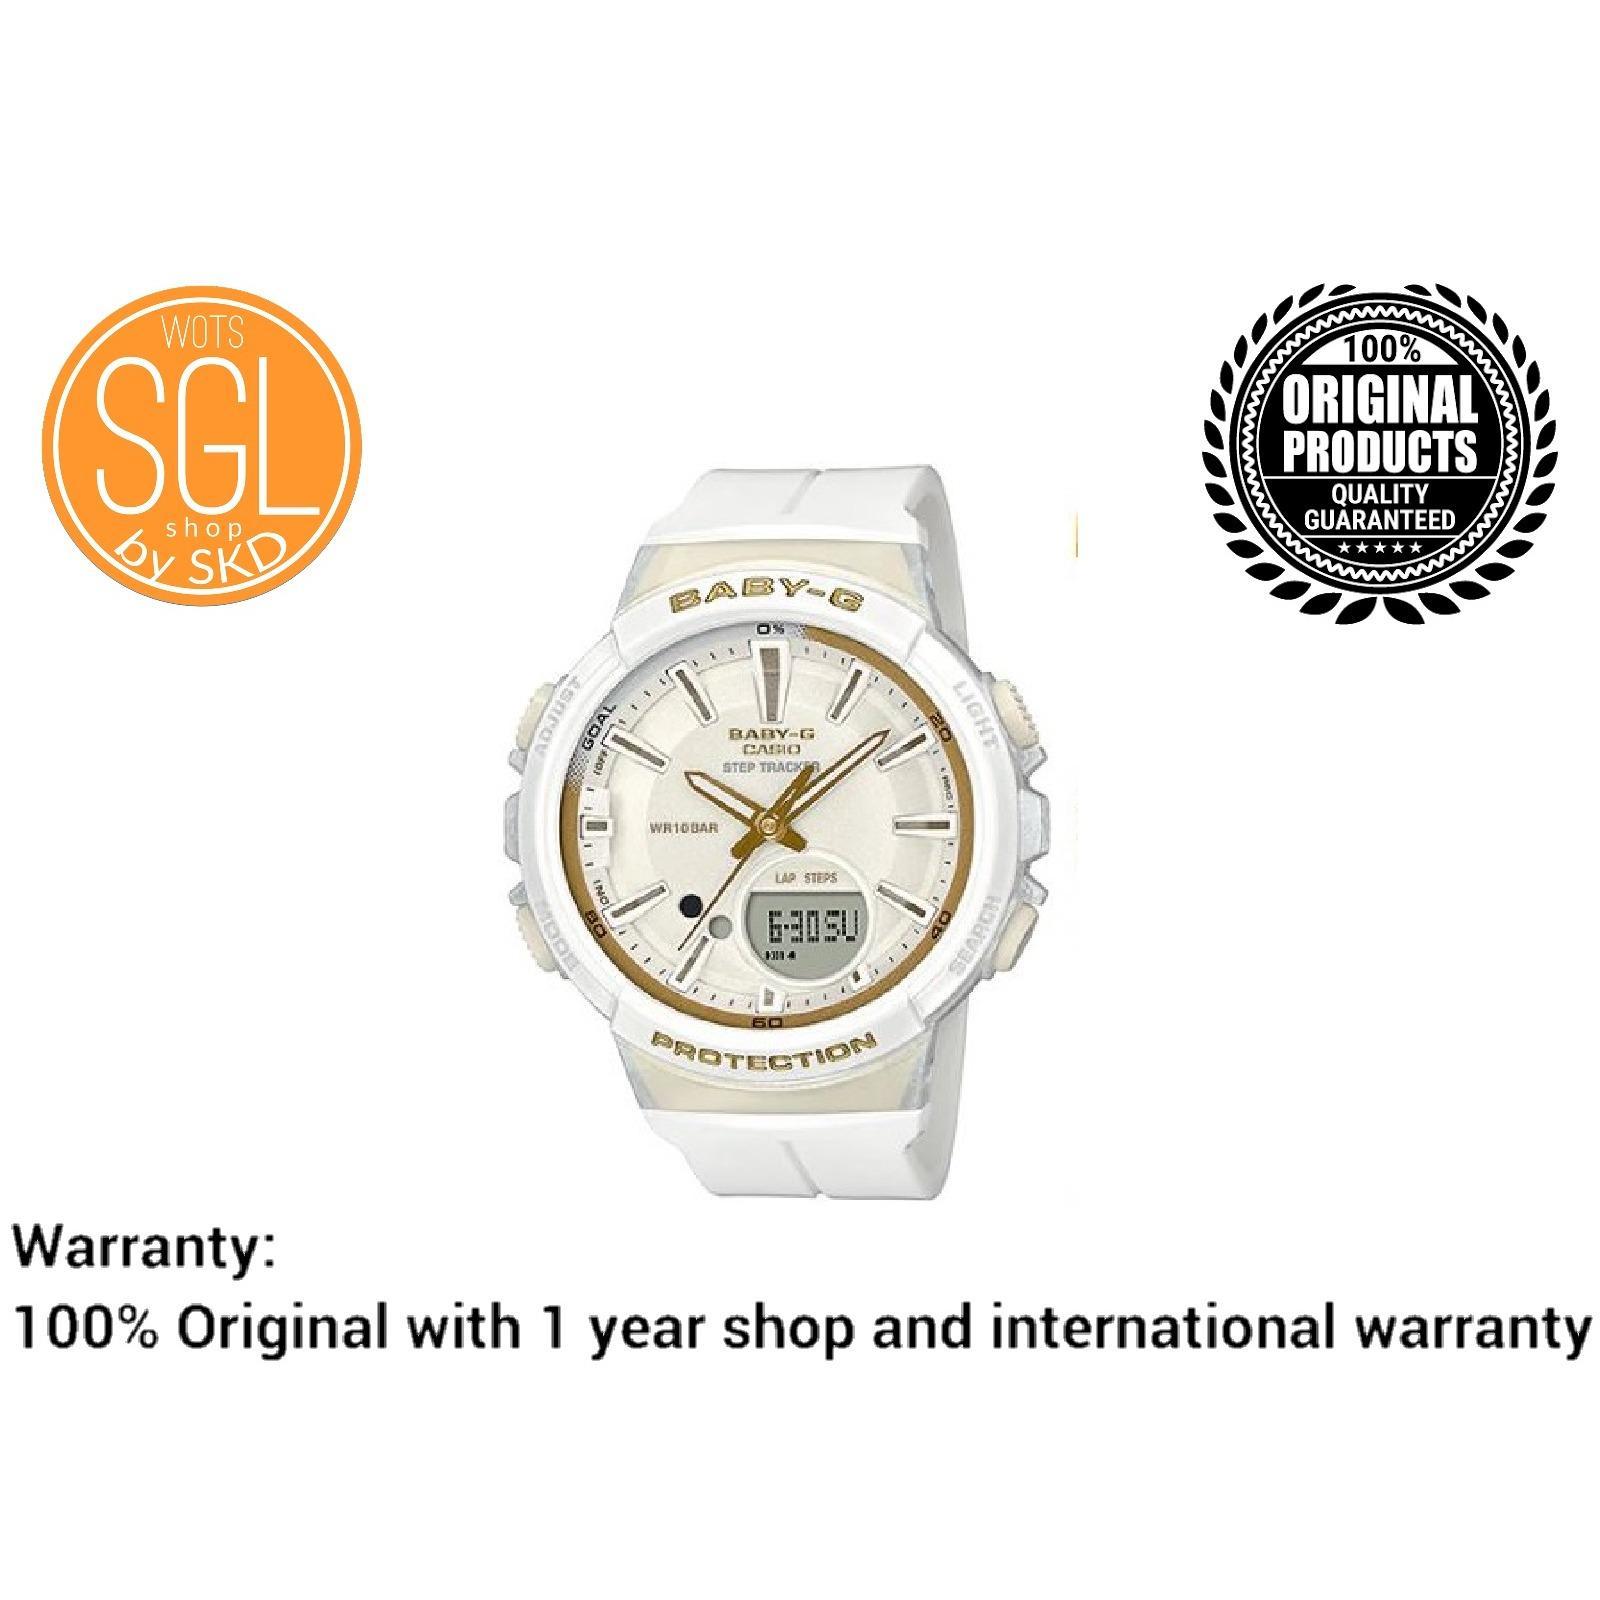 Casio Baby G Ba 110tr 7a White Philippines Price Specs Bga 230 7b2 Original Step Tracker Series Watch Bgs100gs 7